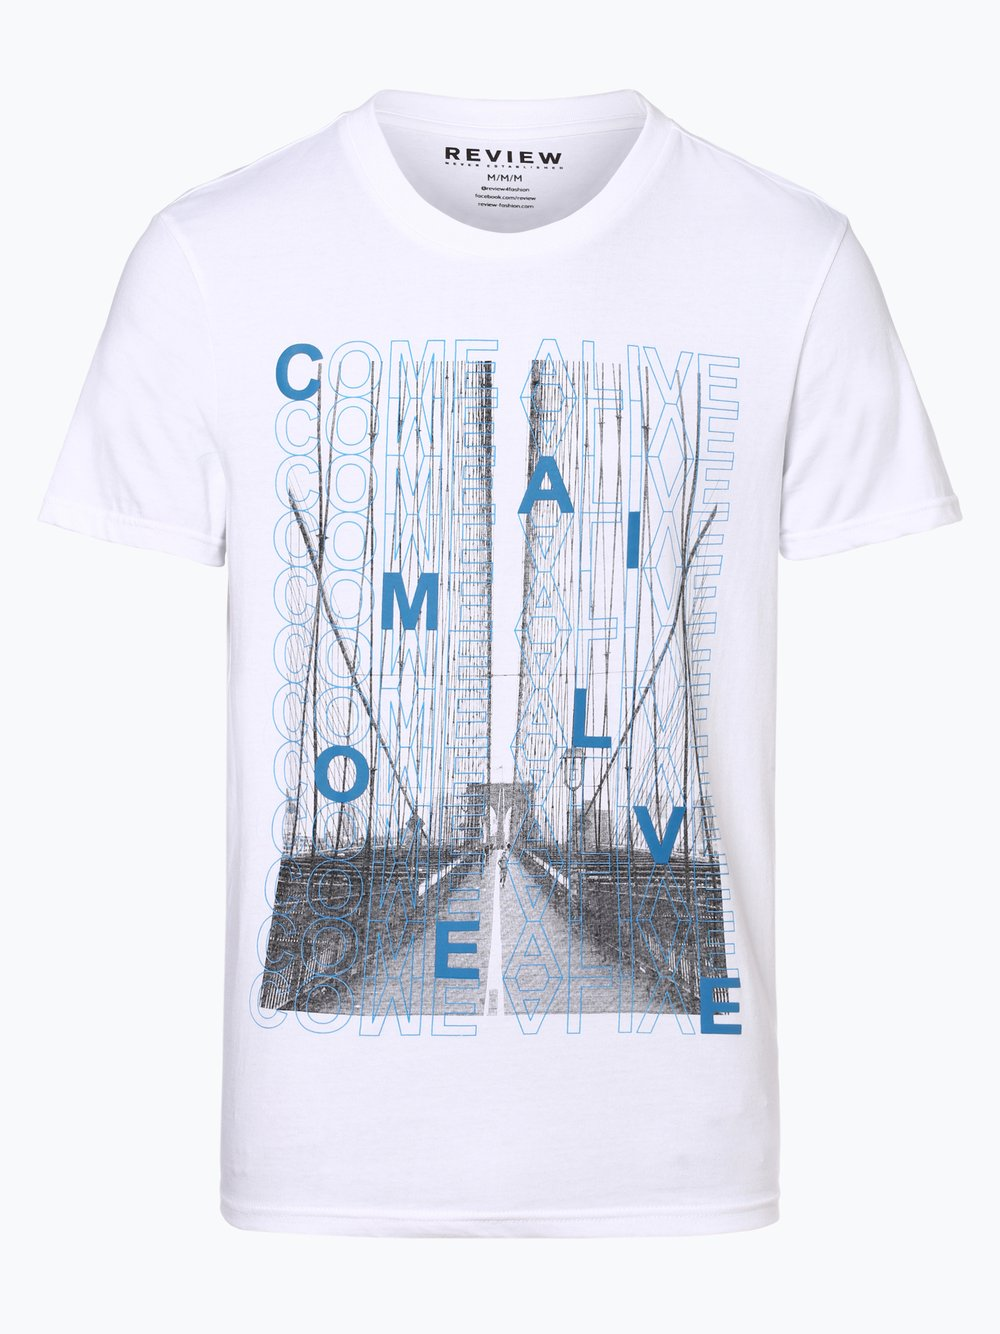 be975f3c3d1862 Review Herren T-Shirt weiß bedruckt online kaufen